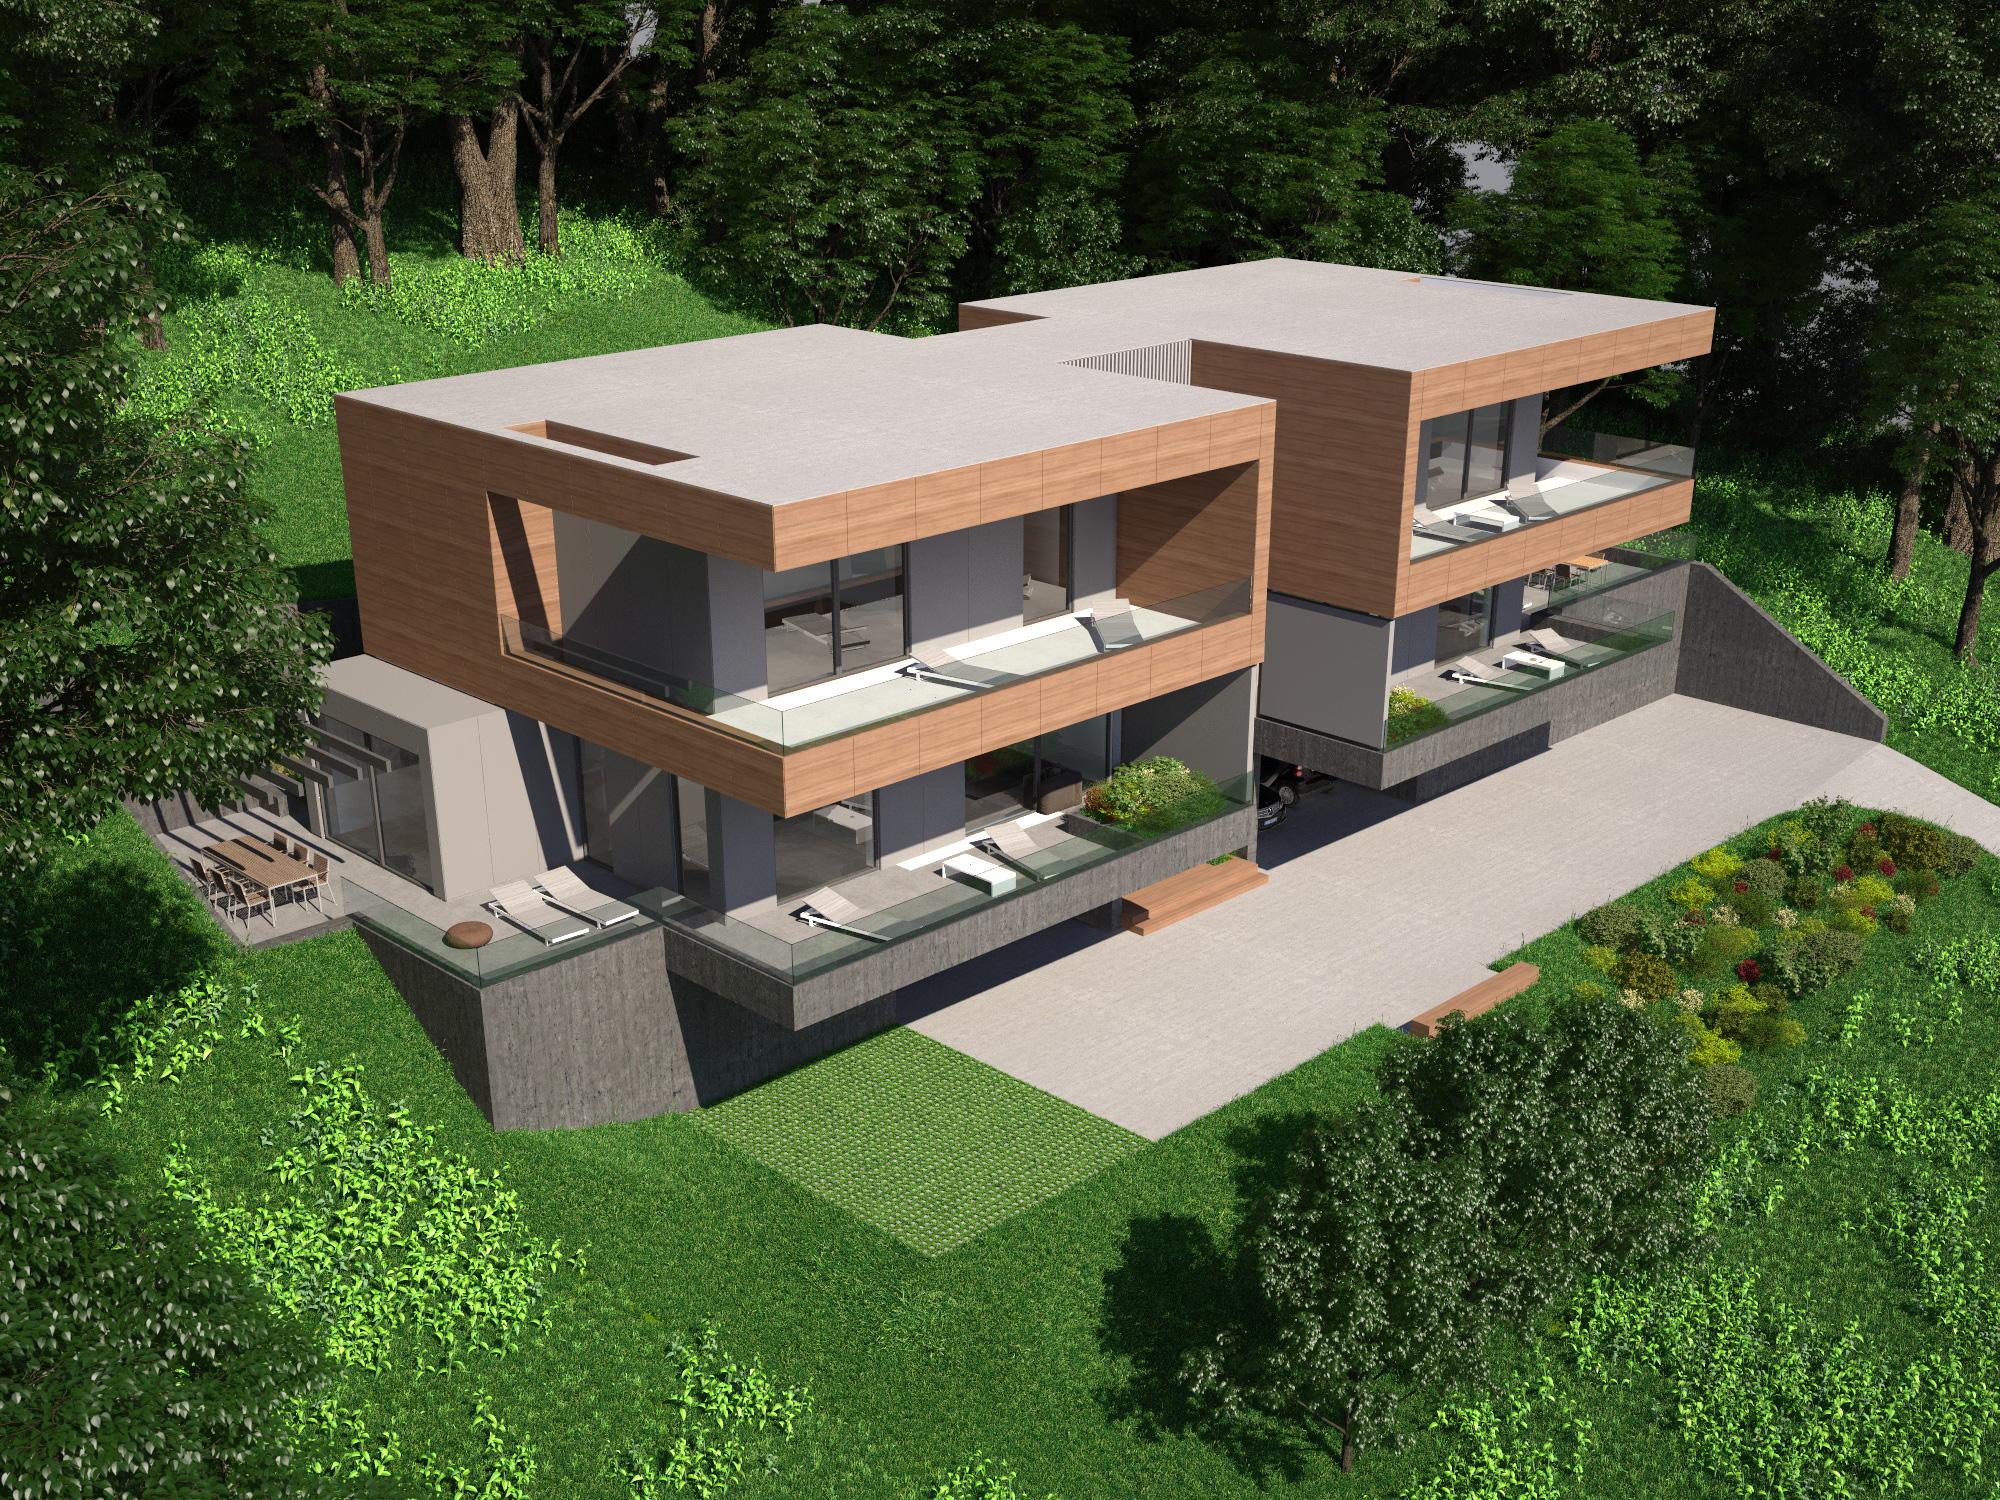 k2-house-01